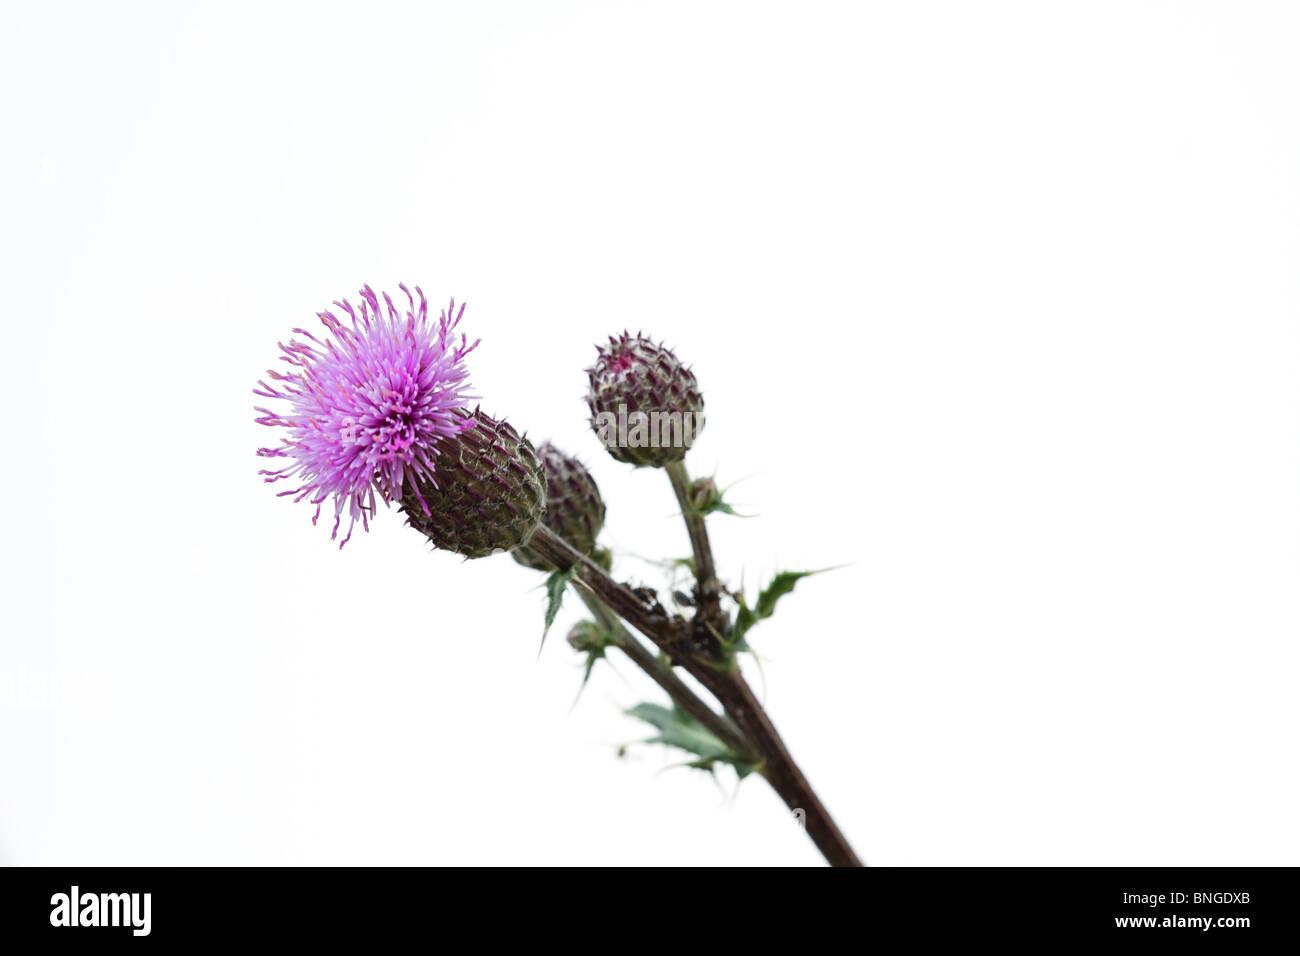 Wildflower, purple Thistle on white background - Stock Image